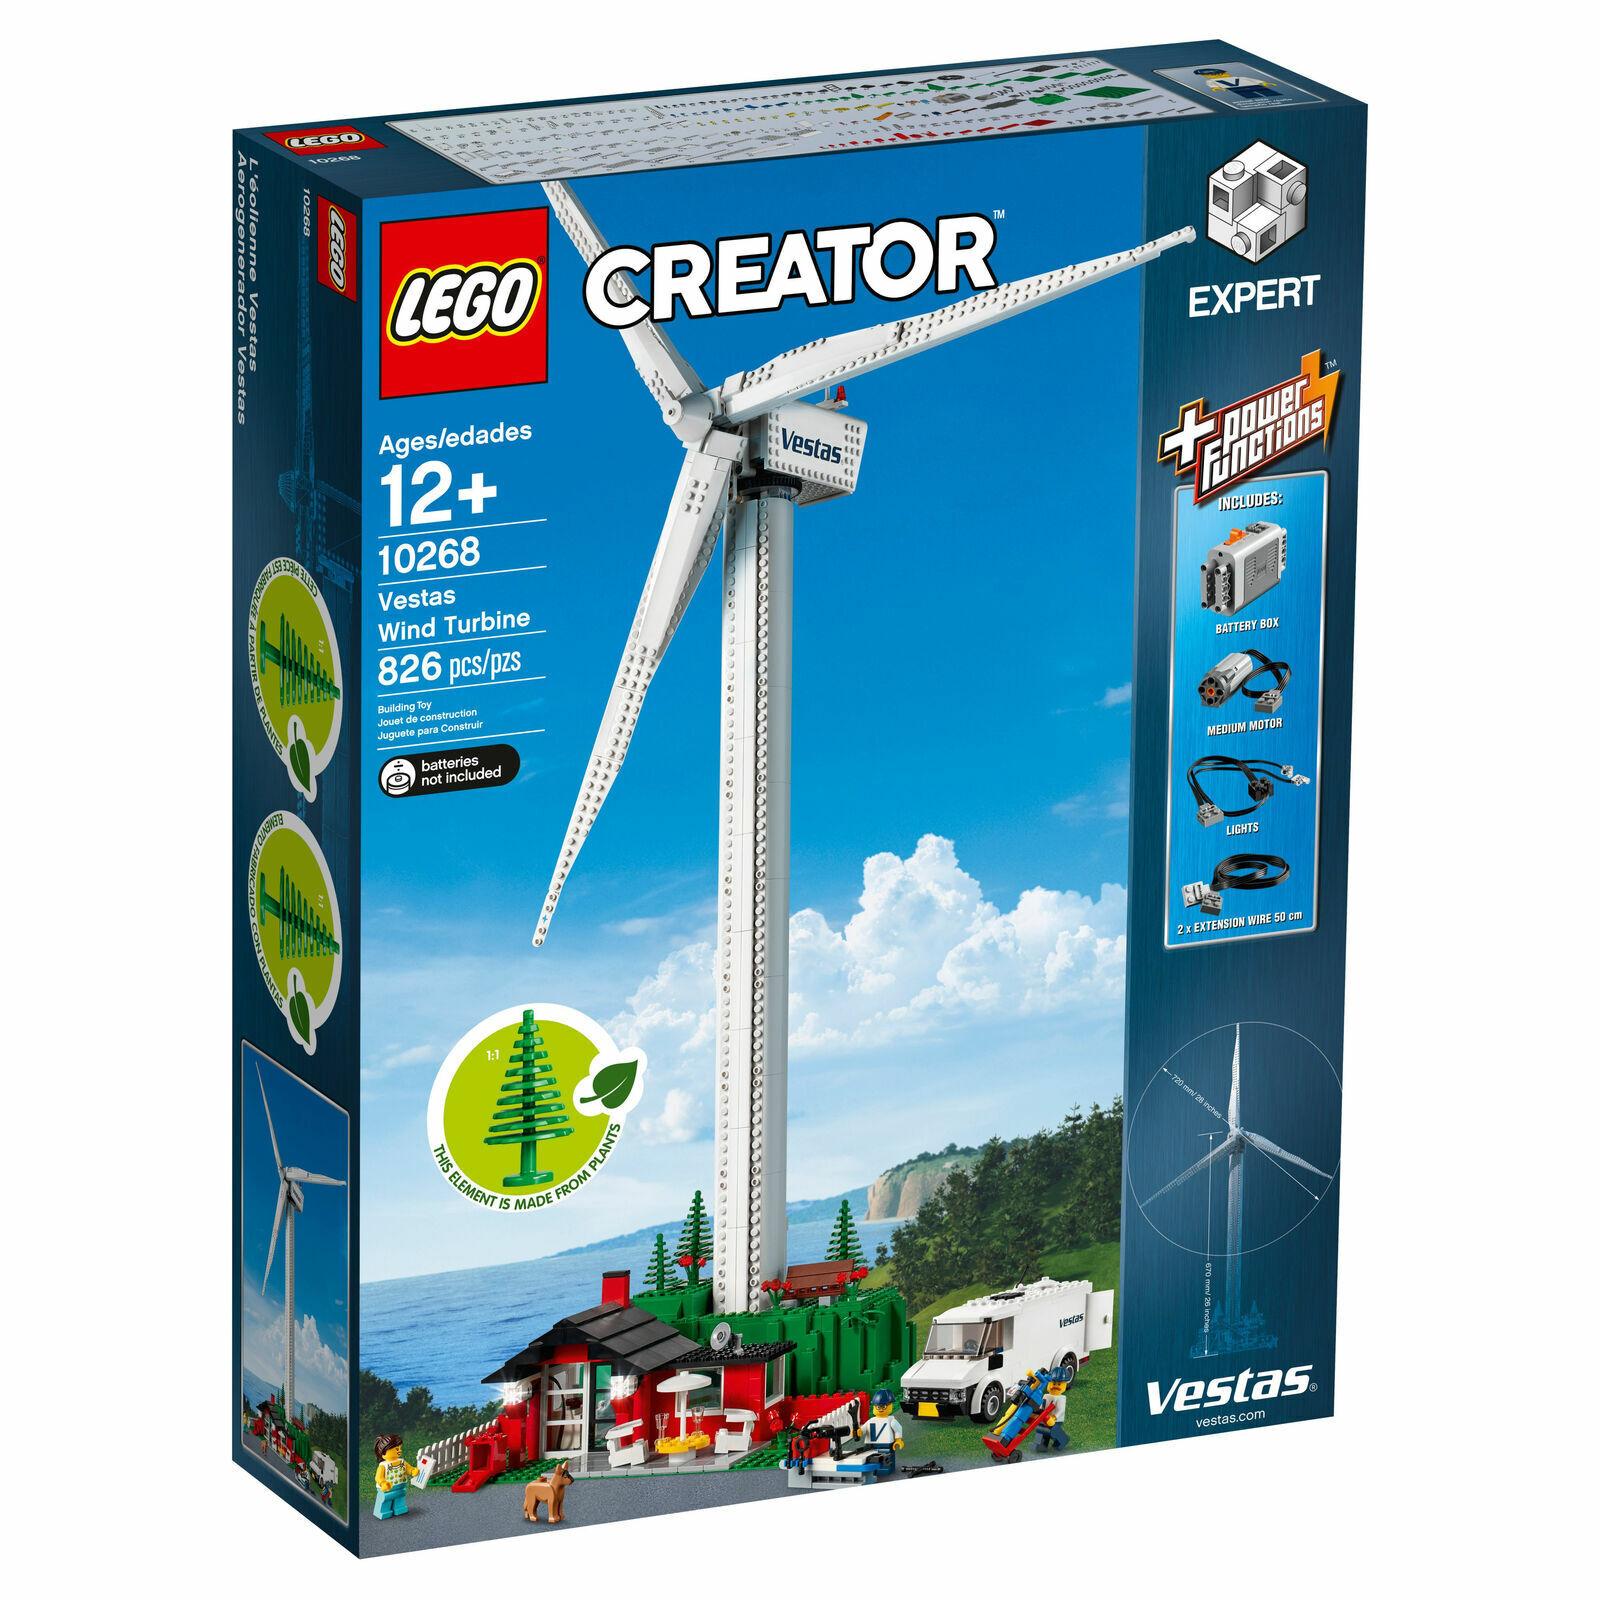 LEGO Creator Vestas Wind  Turbine (10268)  les ventes chaudes